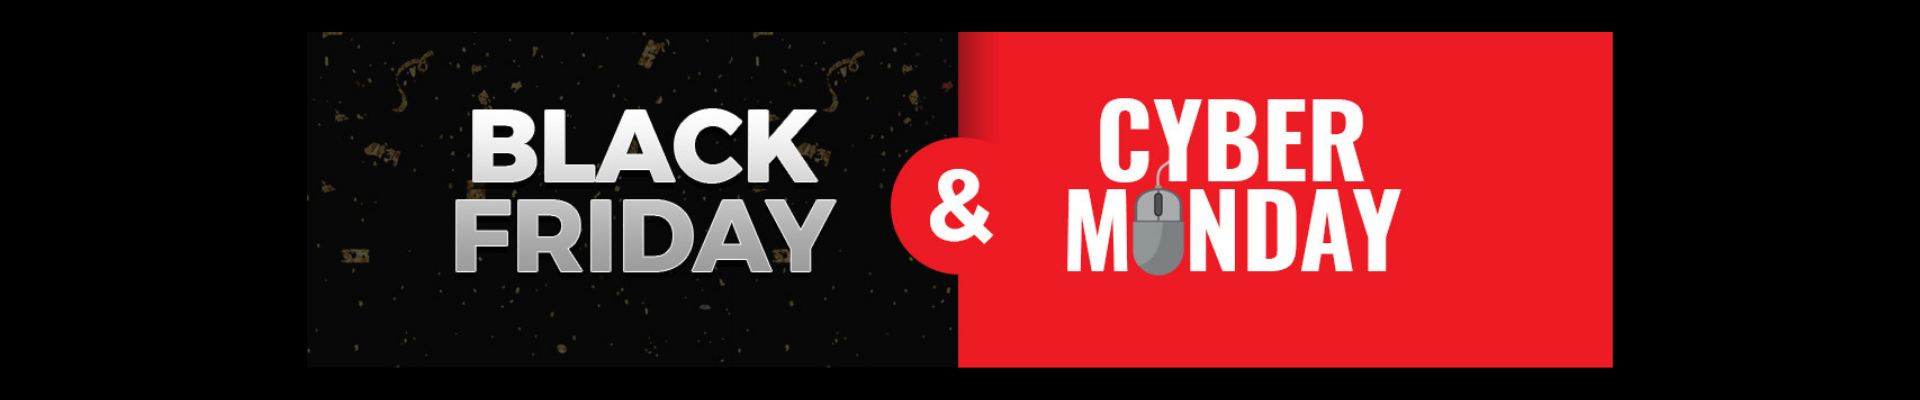 Black friday cyber monday retail